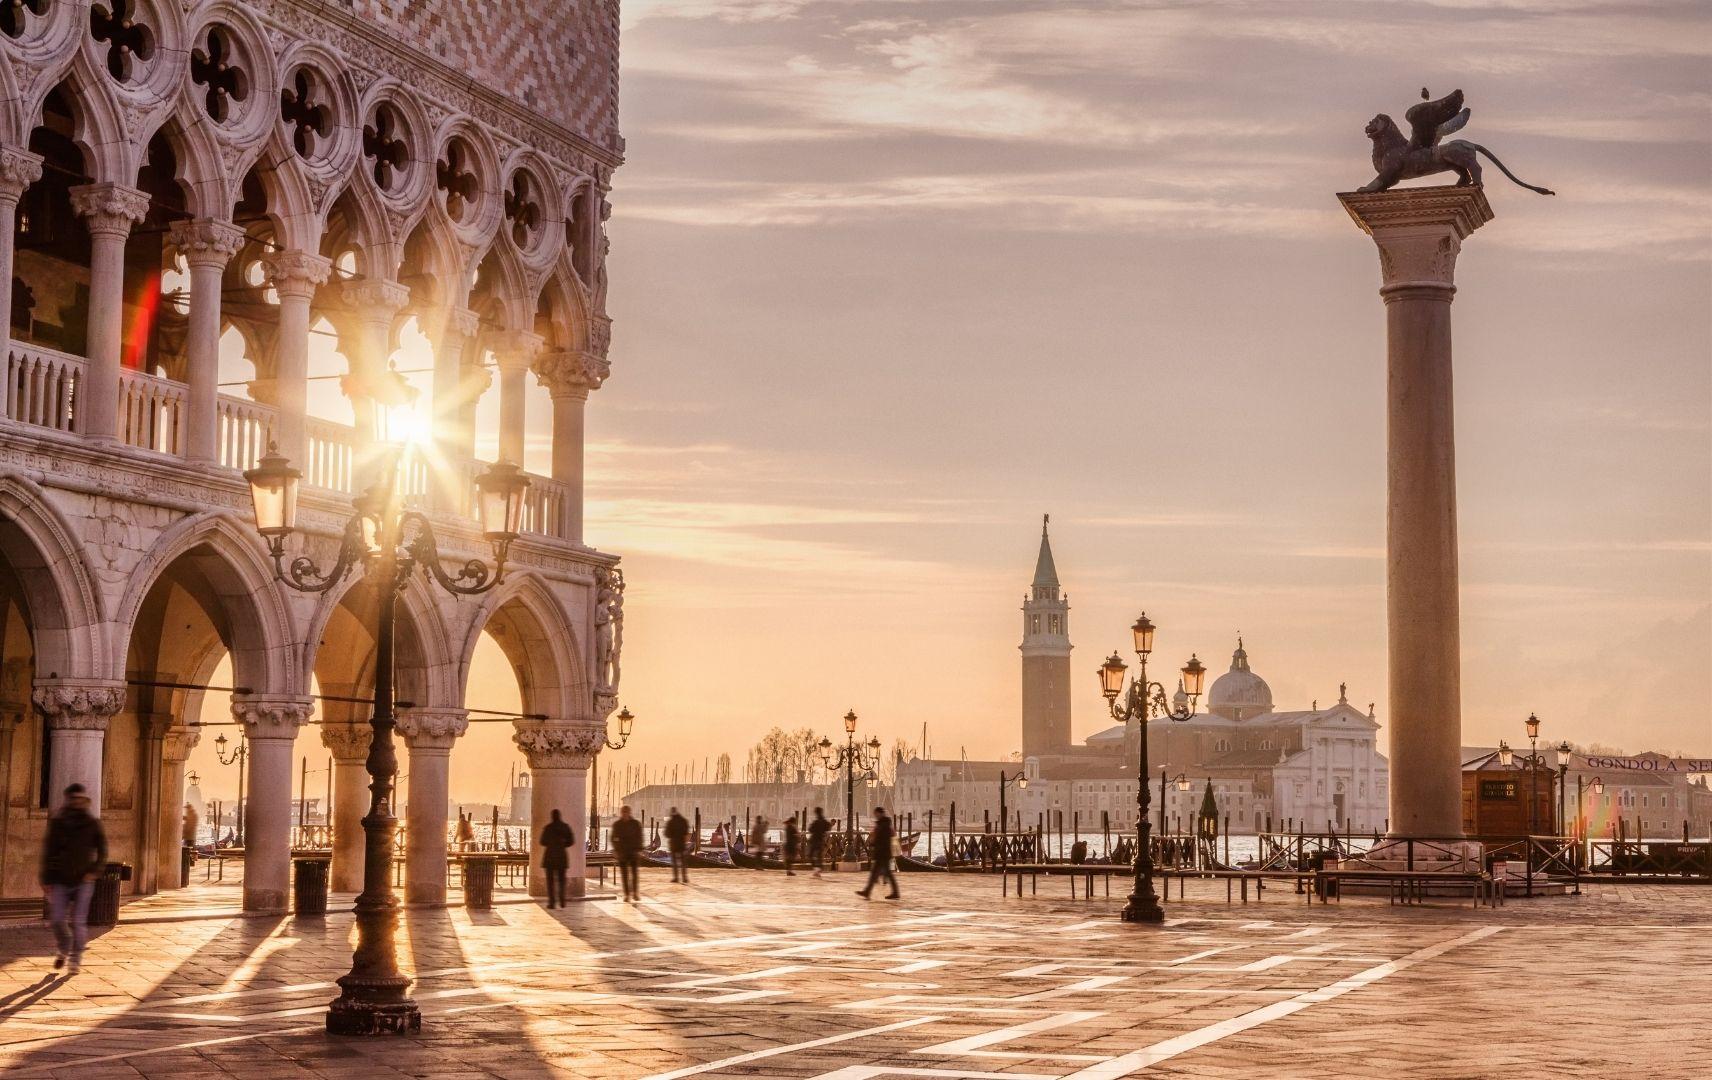 Italien - Venedig, Markusplatz